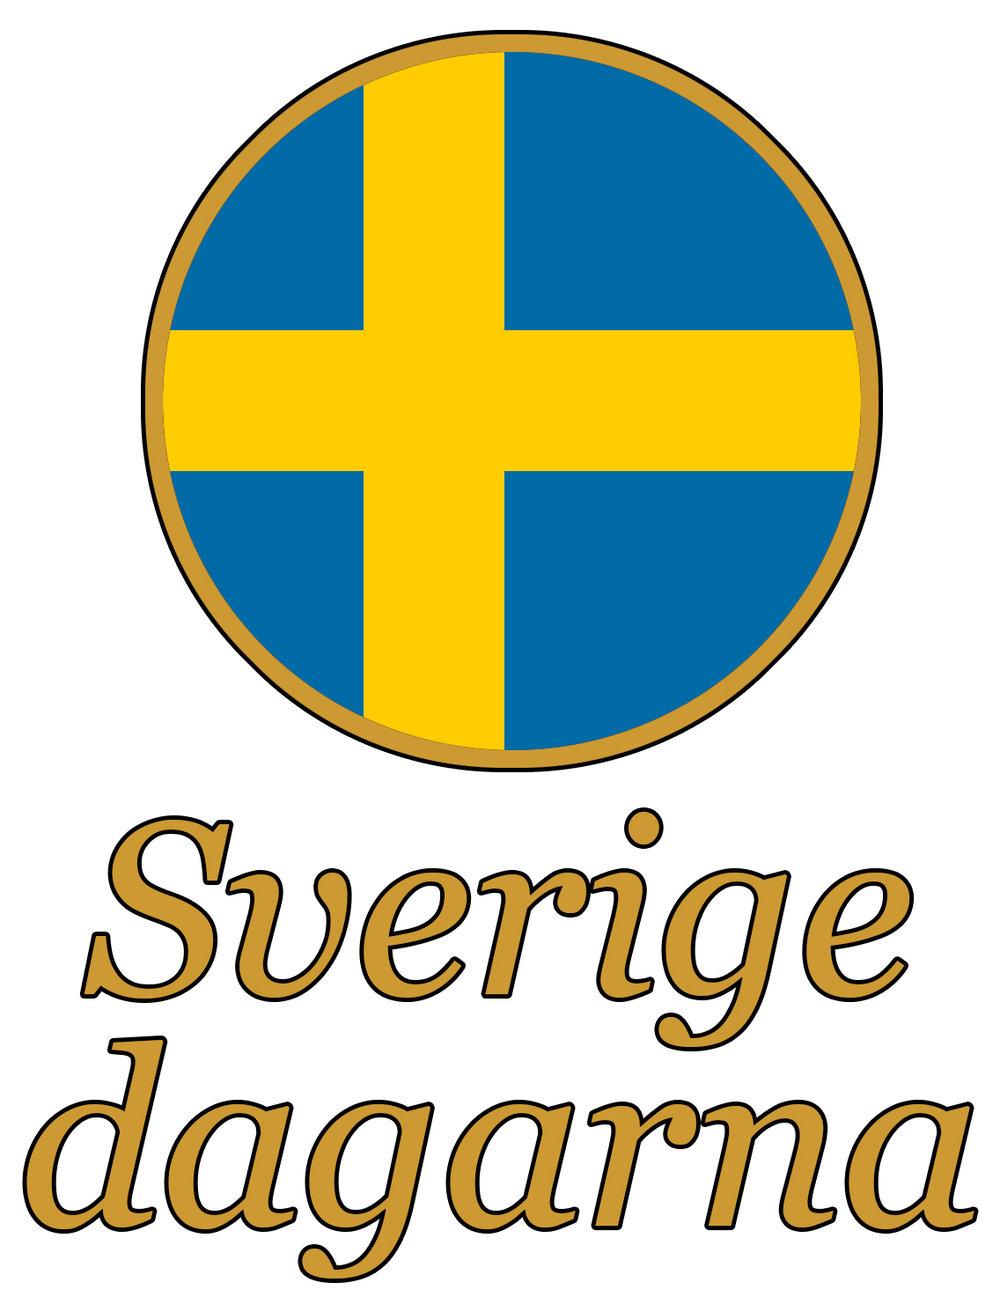 Sverigedagarna-stående.jpg